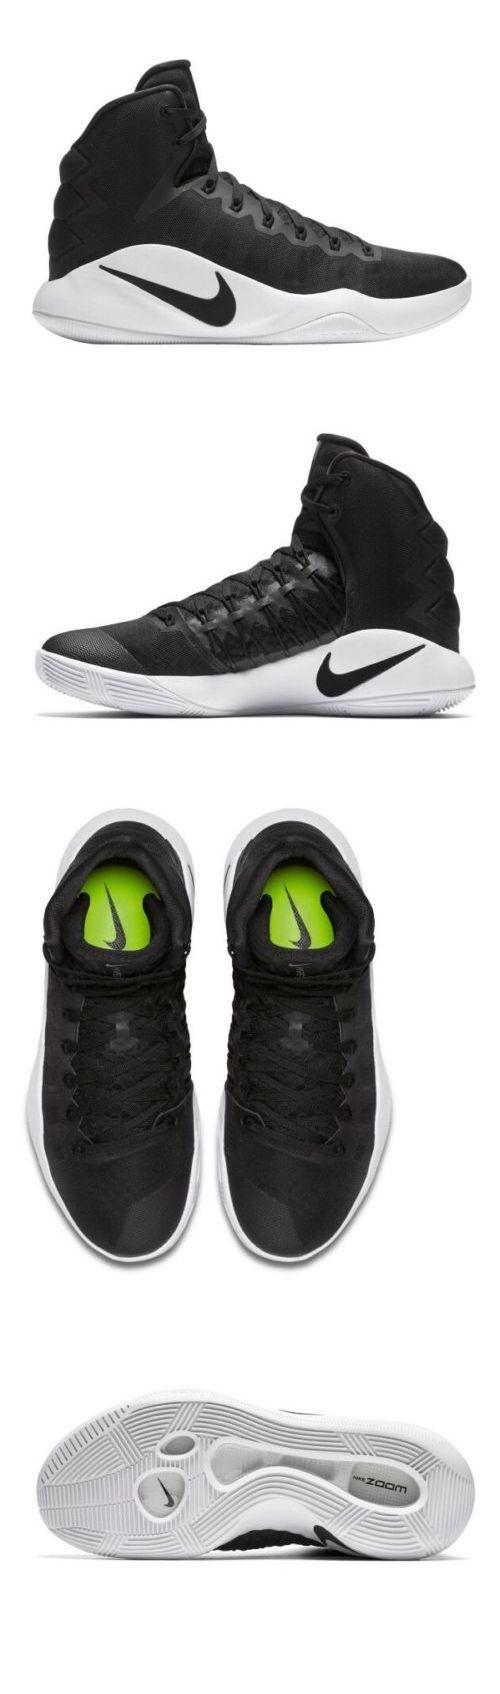 Men 158971: Men Nike Hyperdunk 2016 Tb Basketball Athletic Shoes Black  844368-001 Multi